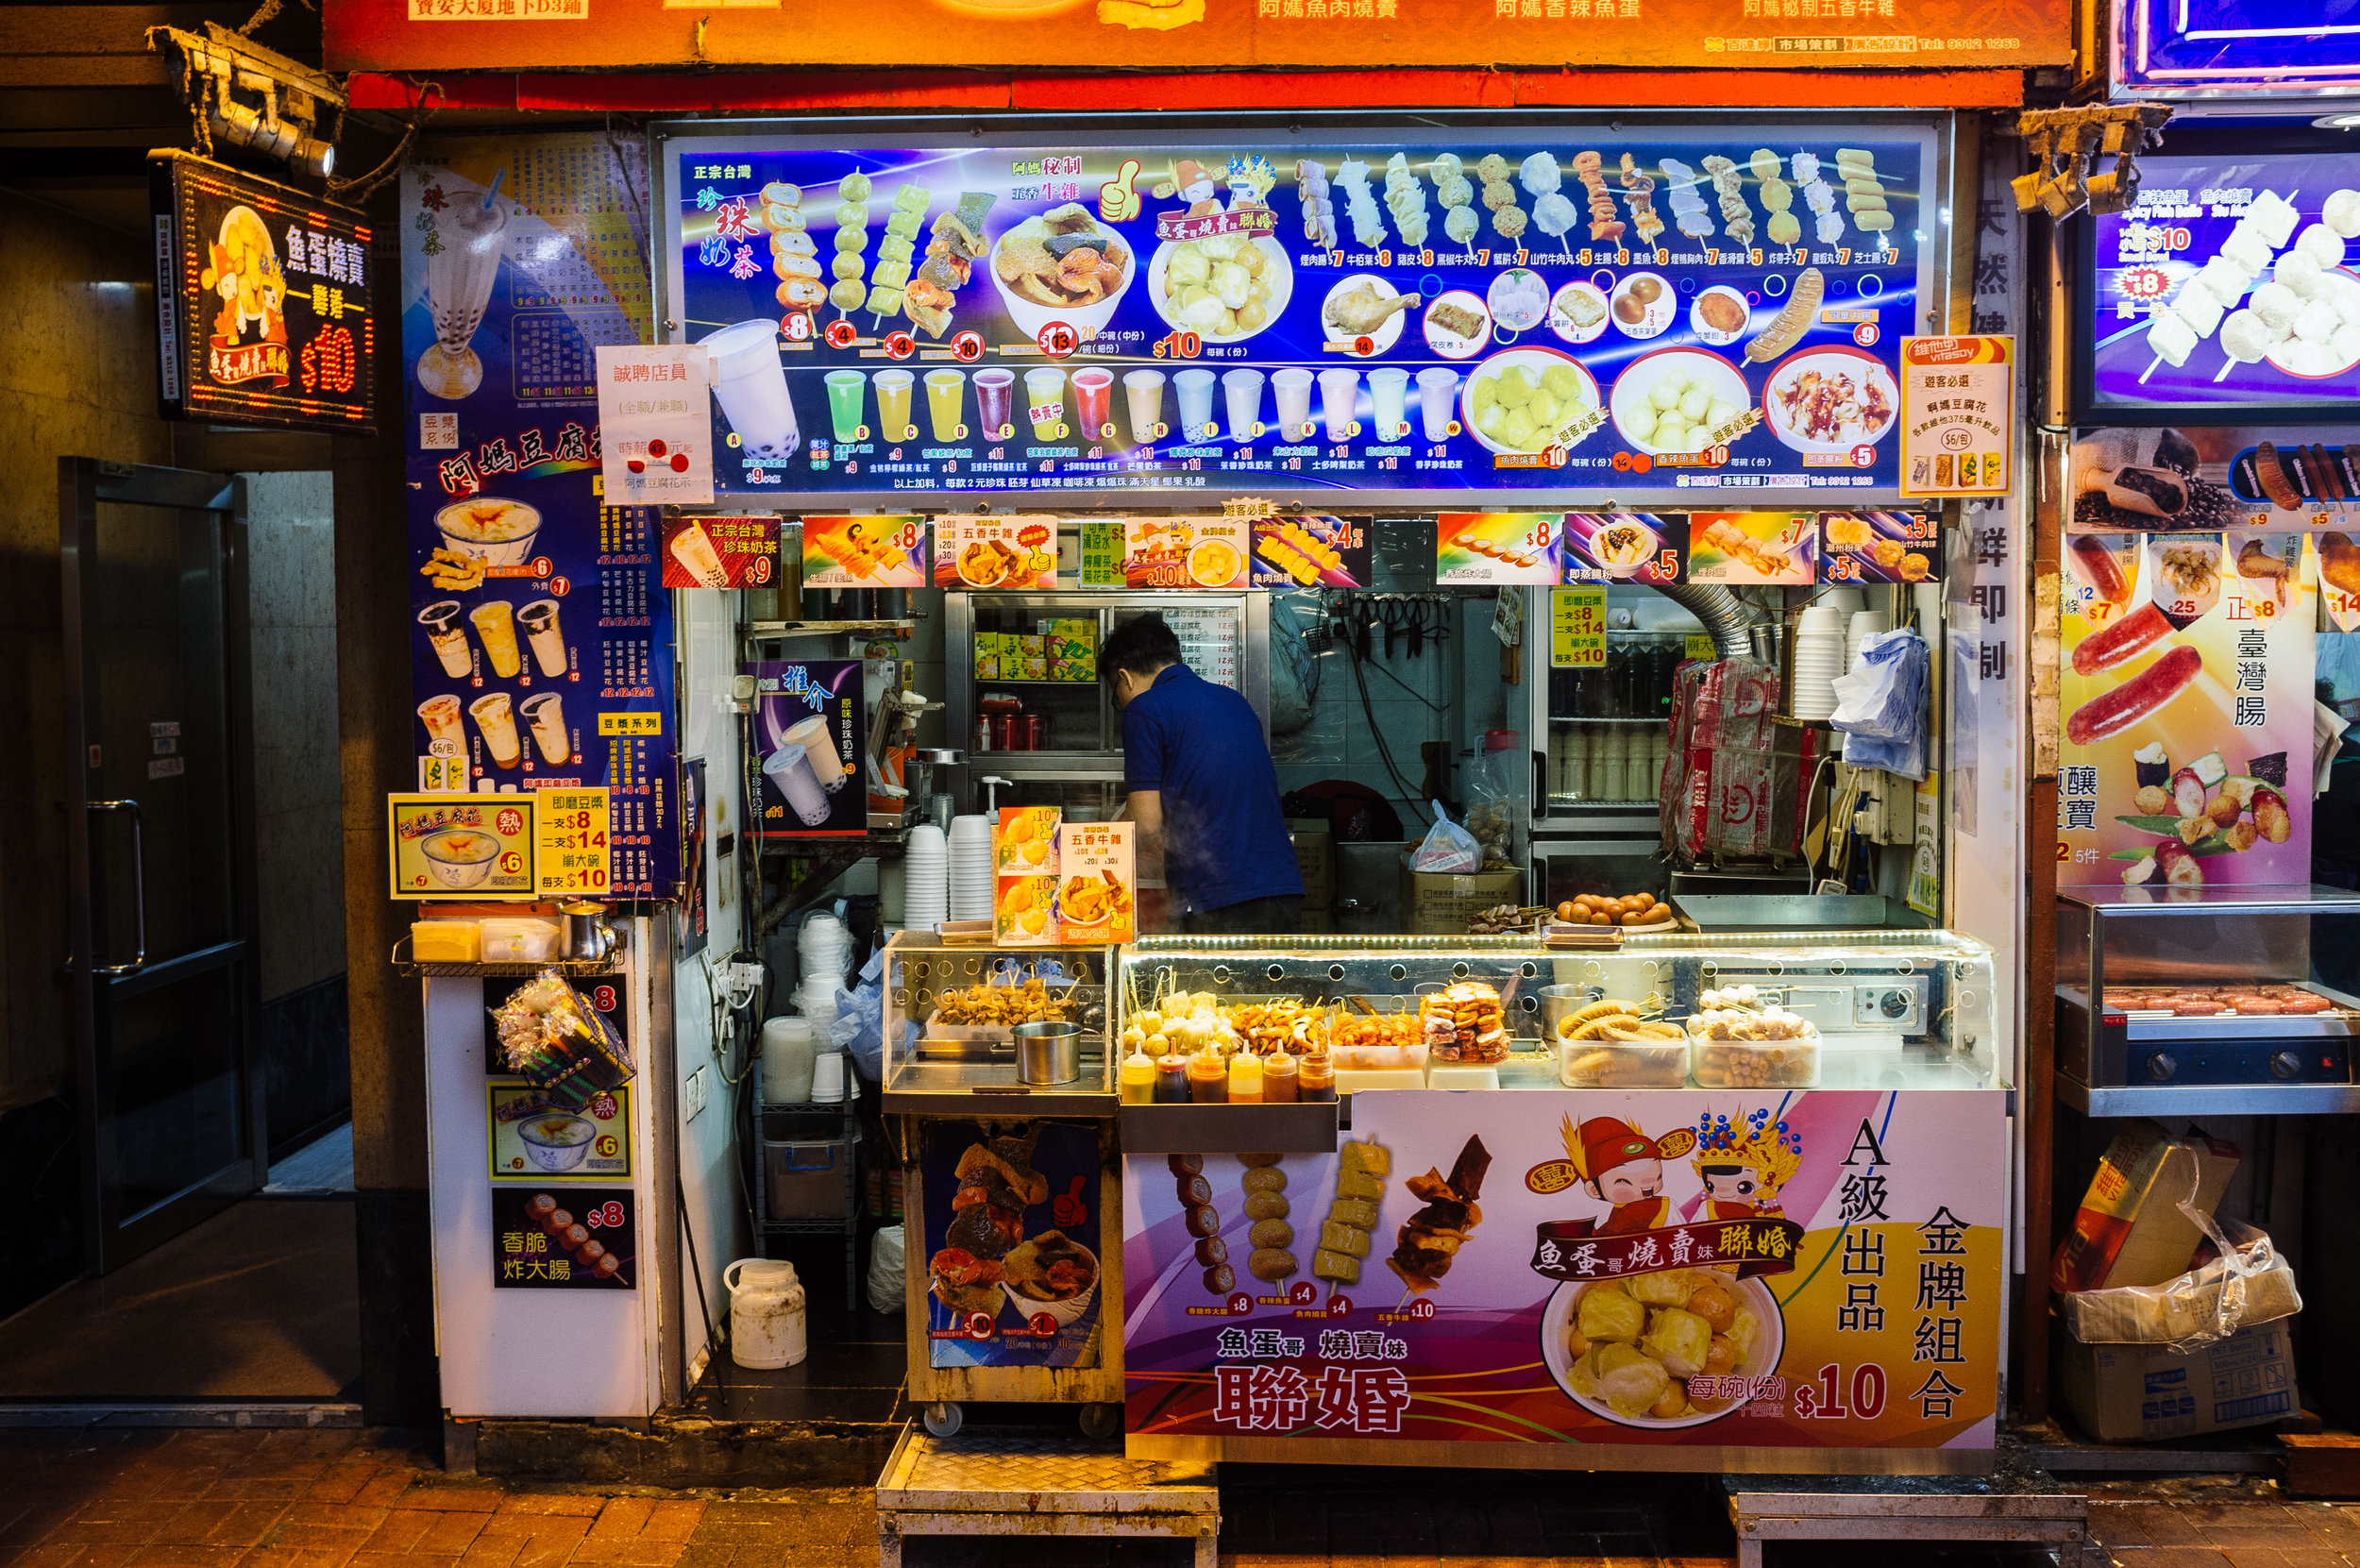 Mong Kok Stall edit.jpg